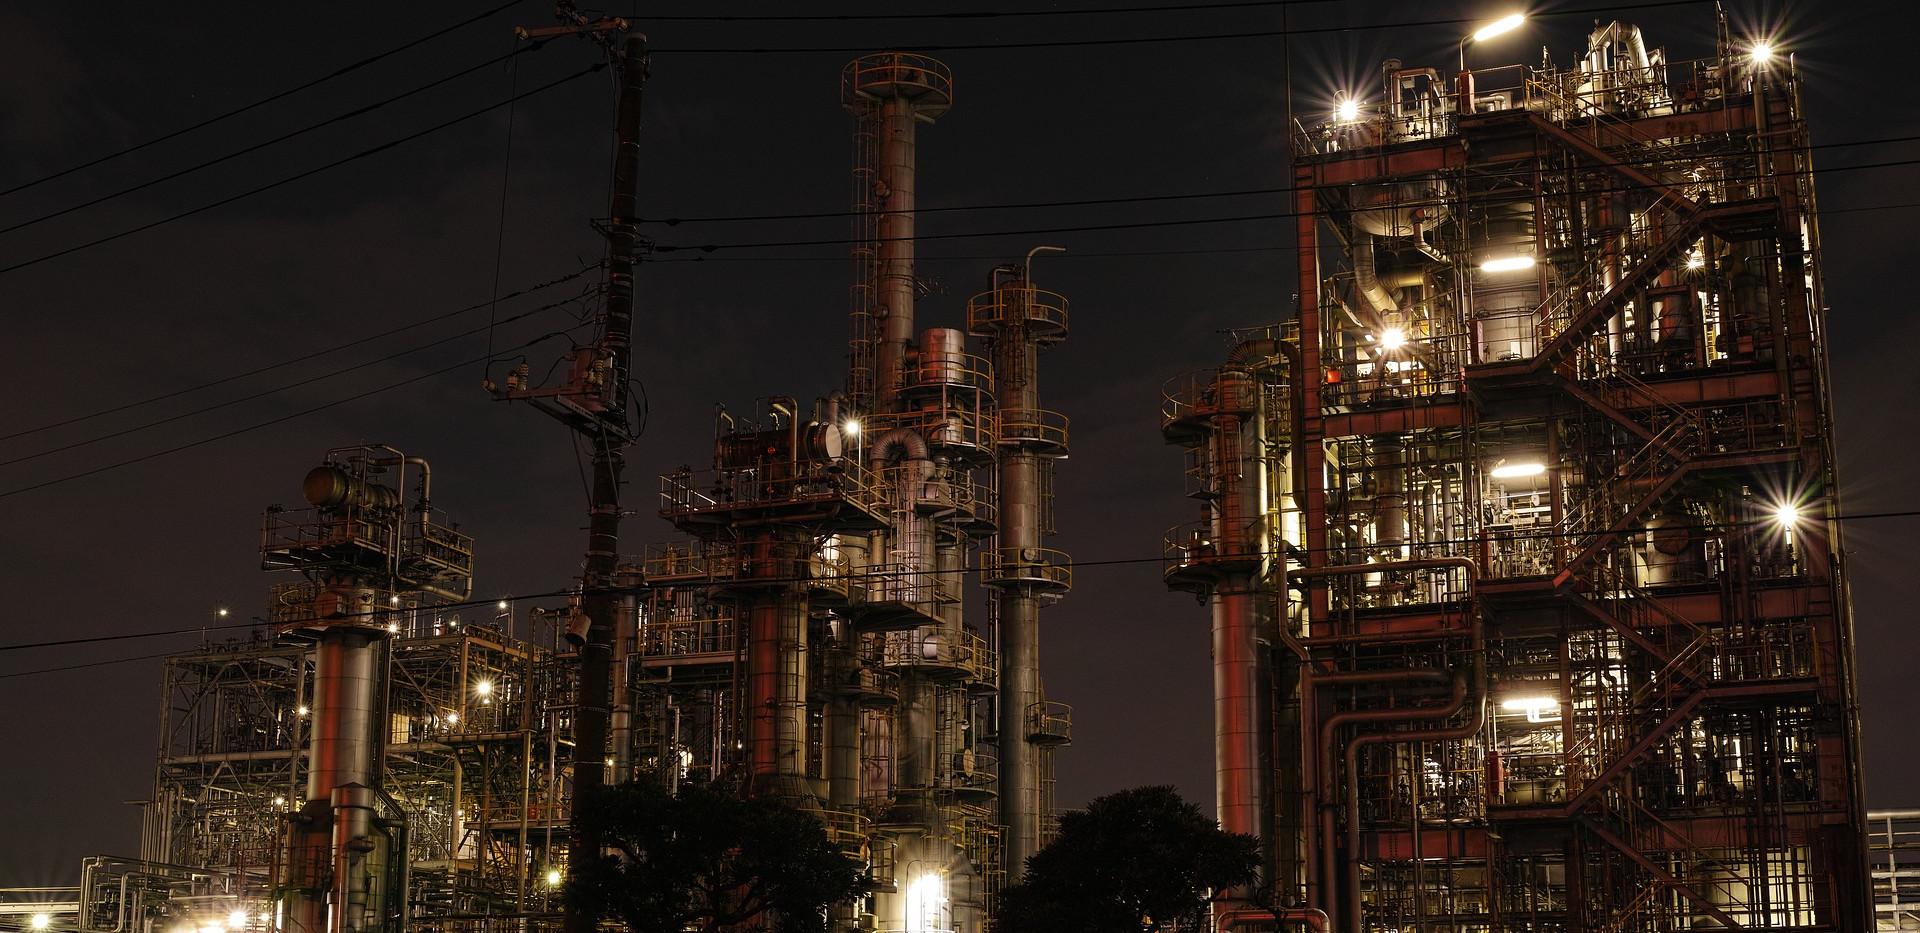 factory-1769429_1920.jpg